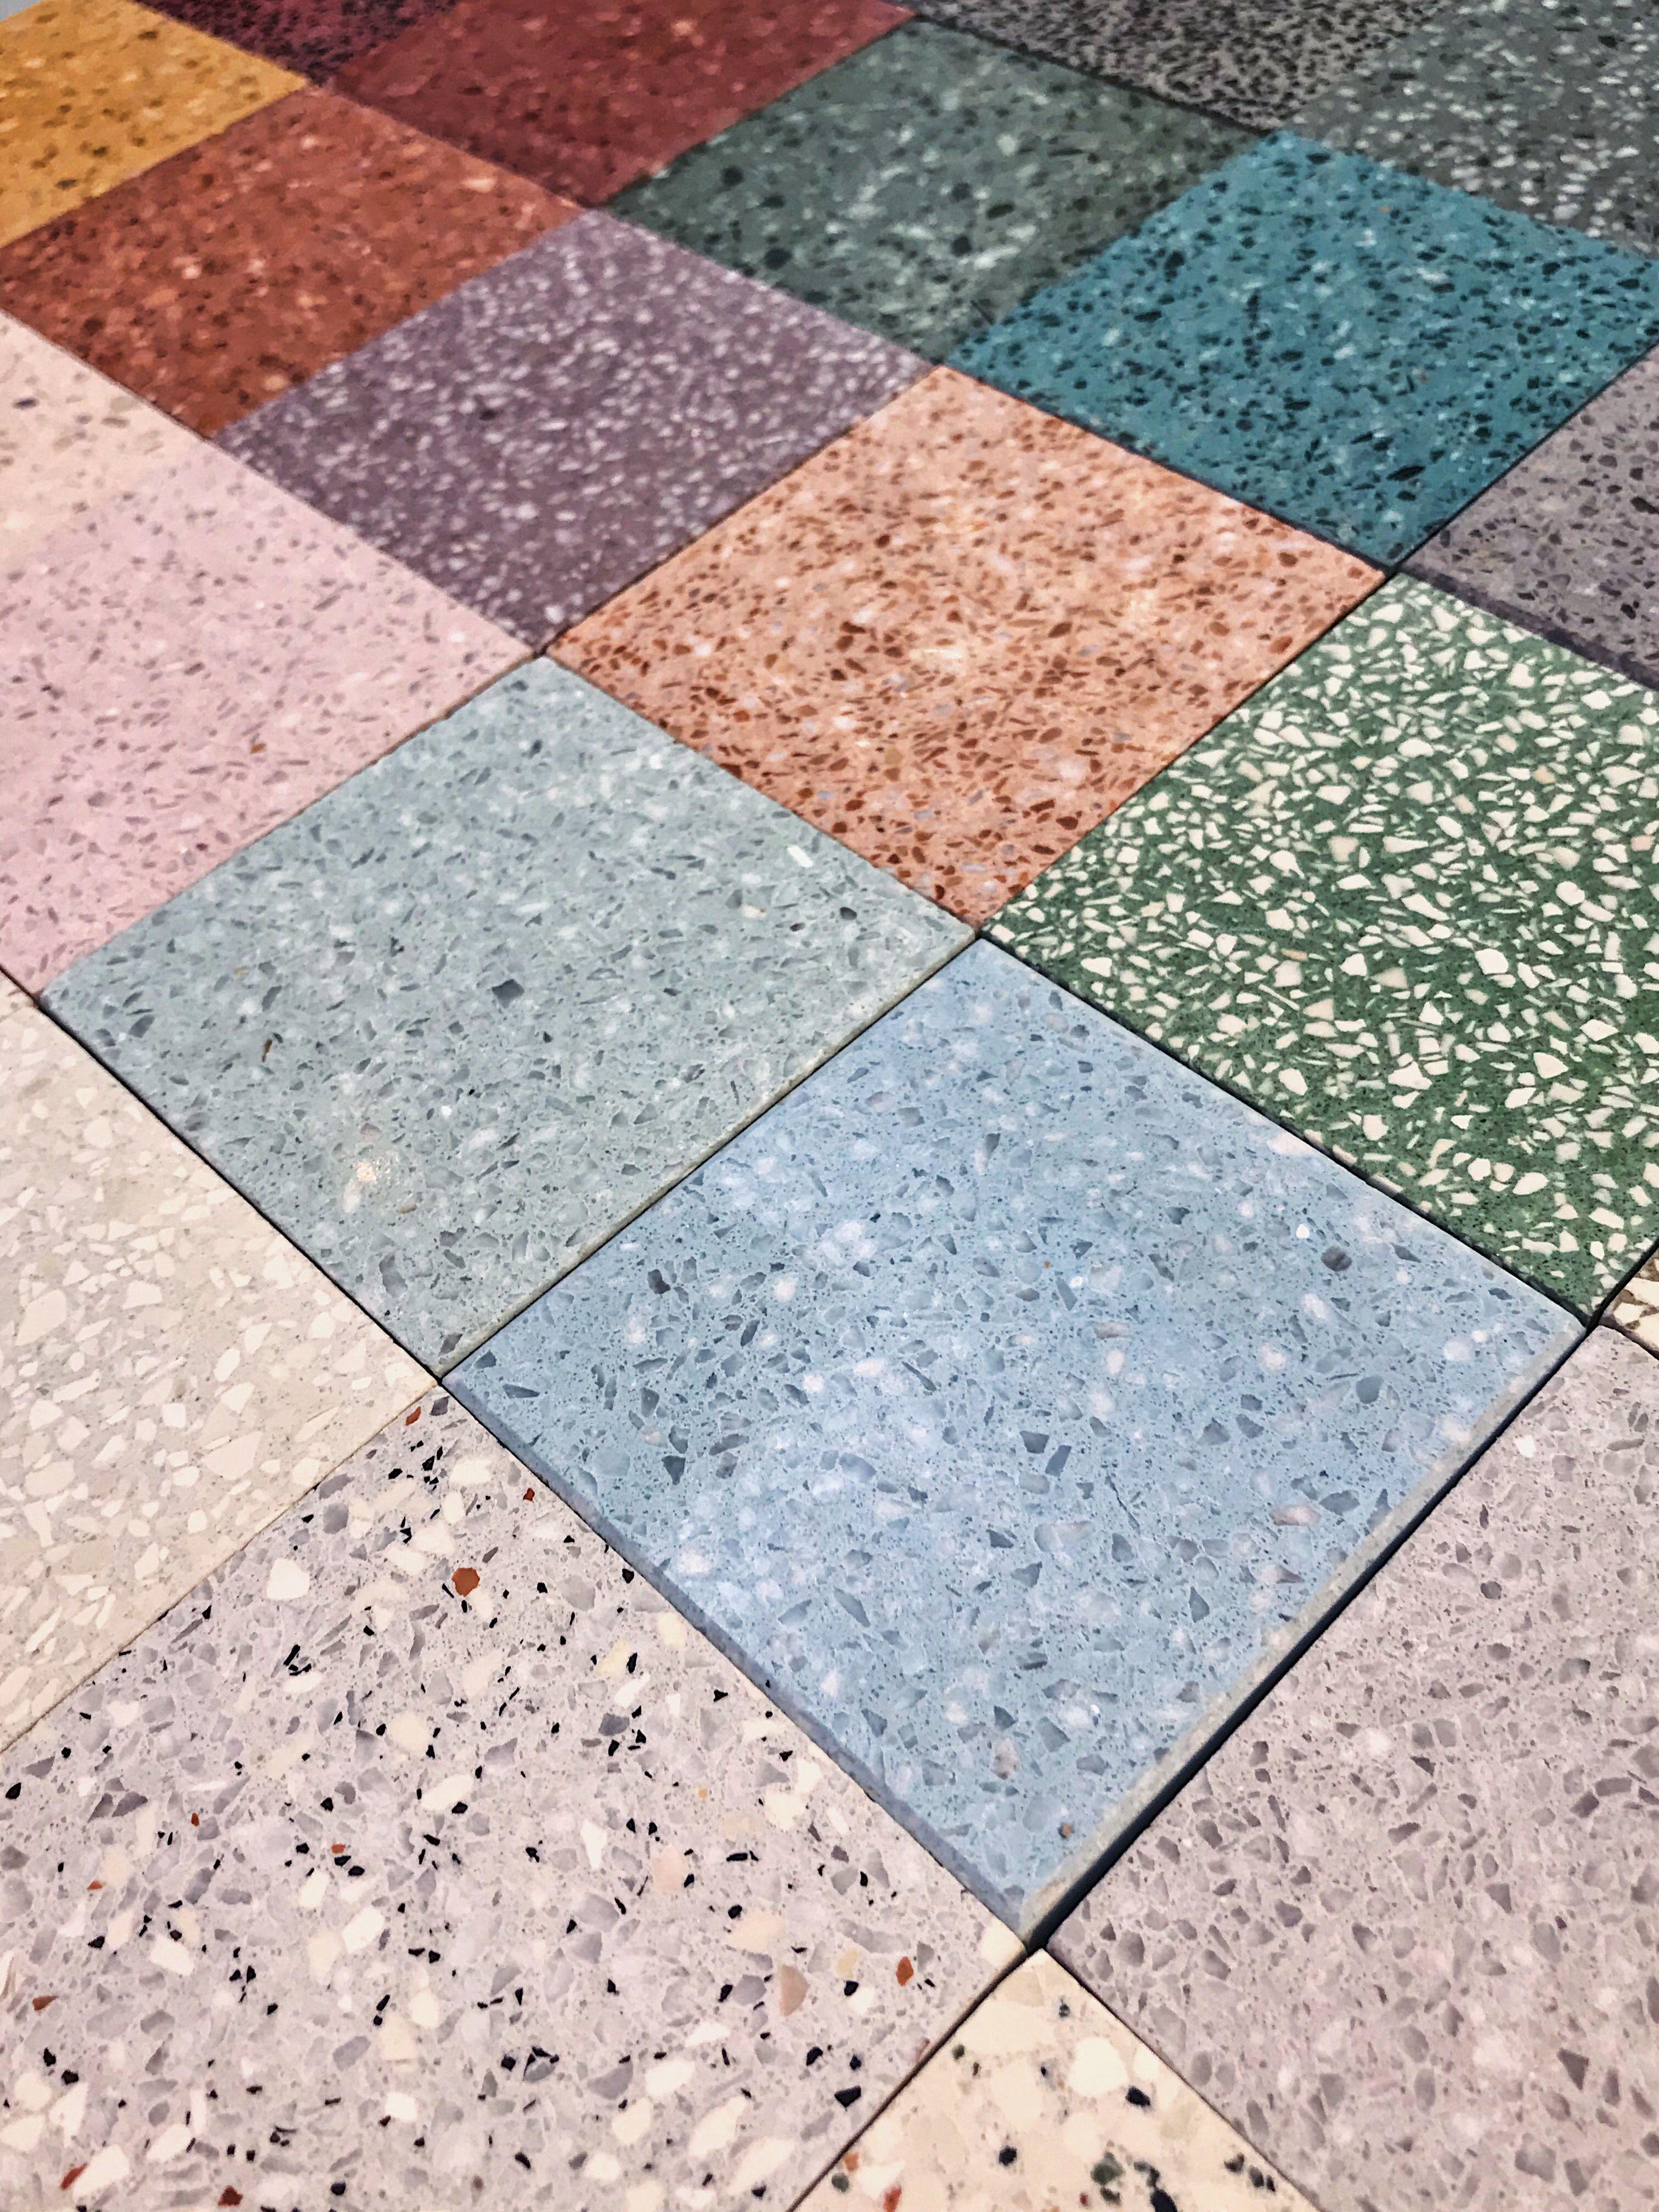 terrazzo mosaic marble tiles   terrazzo  terrazzotiles  terrazzomarble  interiors  architecture